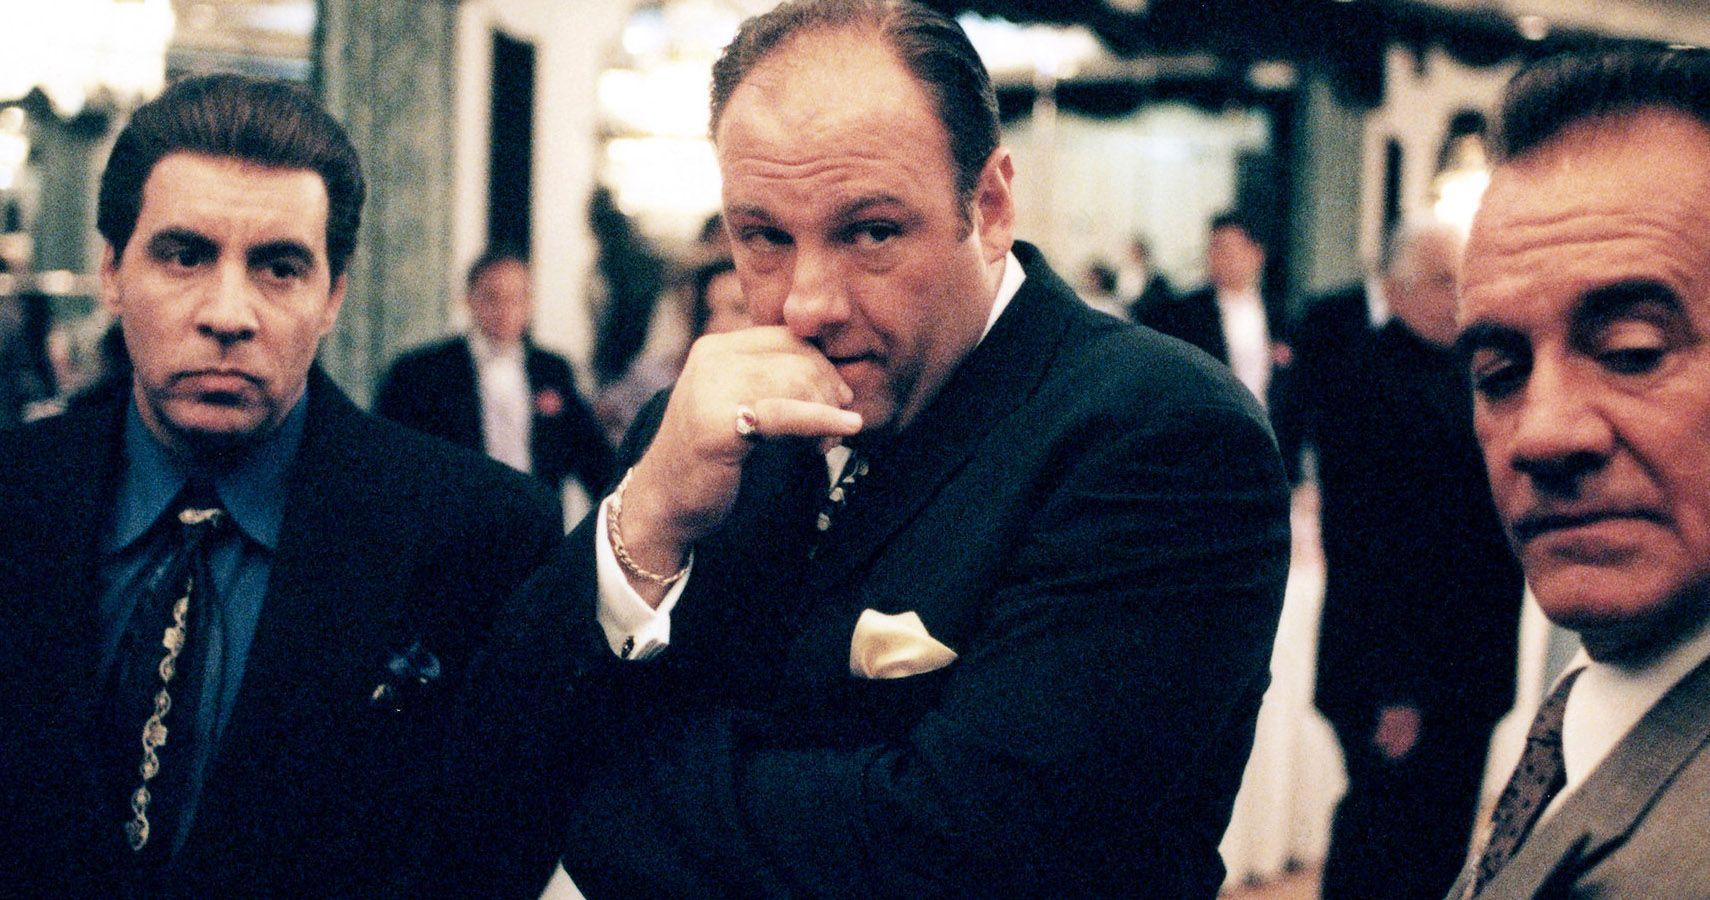 The 10 Worst Episodes of The Sopranos, According To IMDb